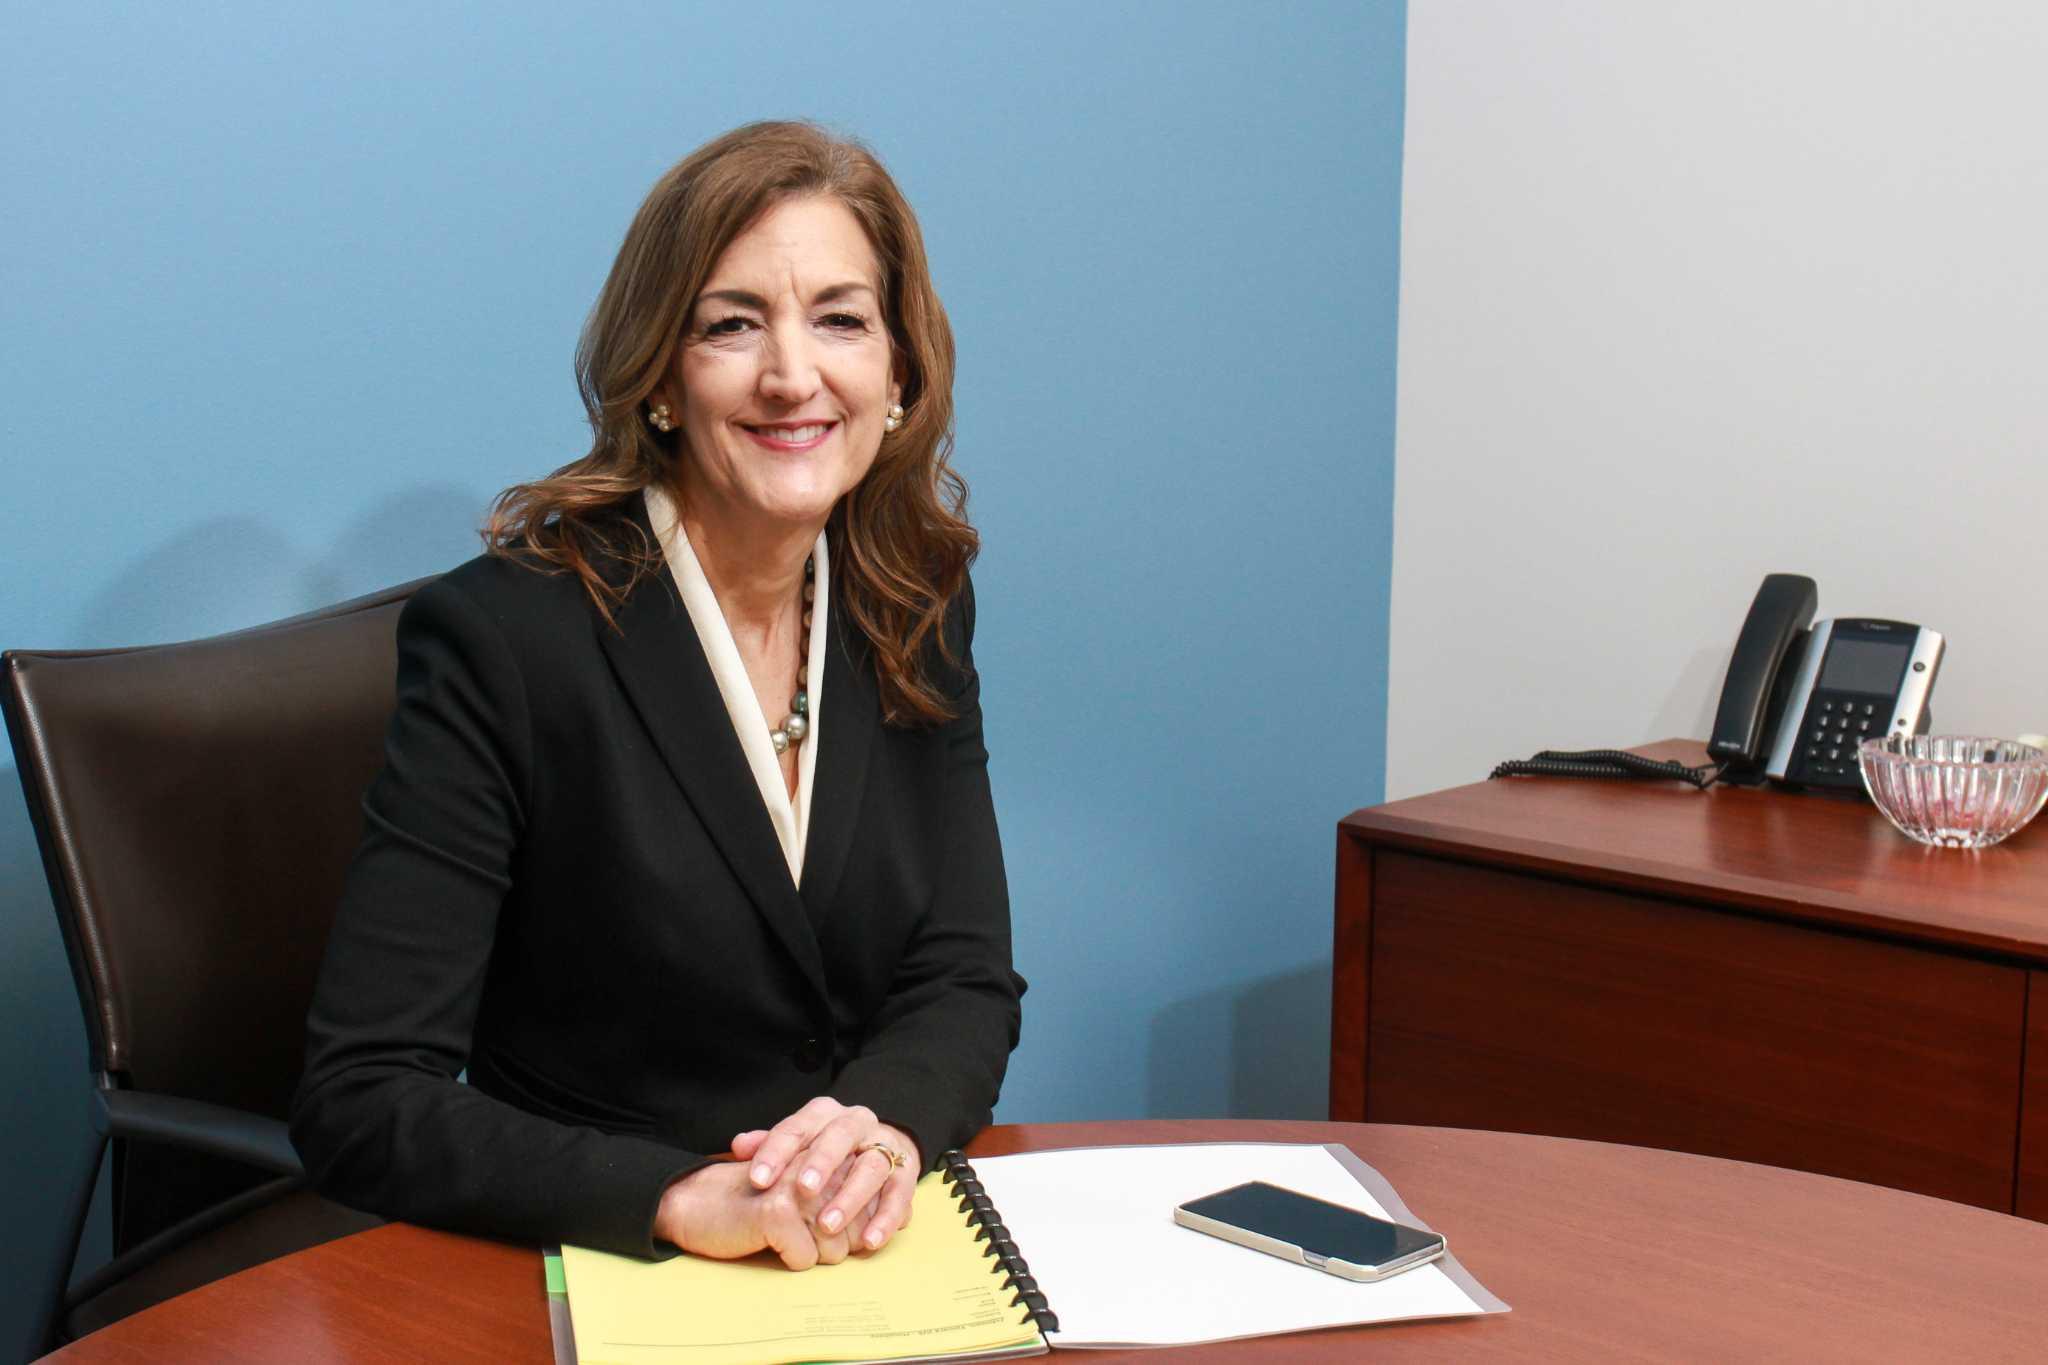 Q&A: Deloitte partner leads more women into boardrooms ...